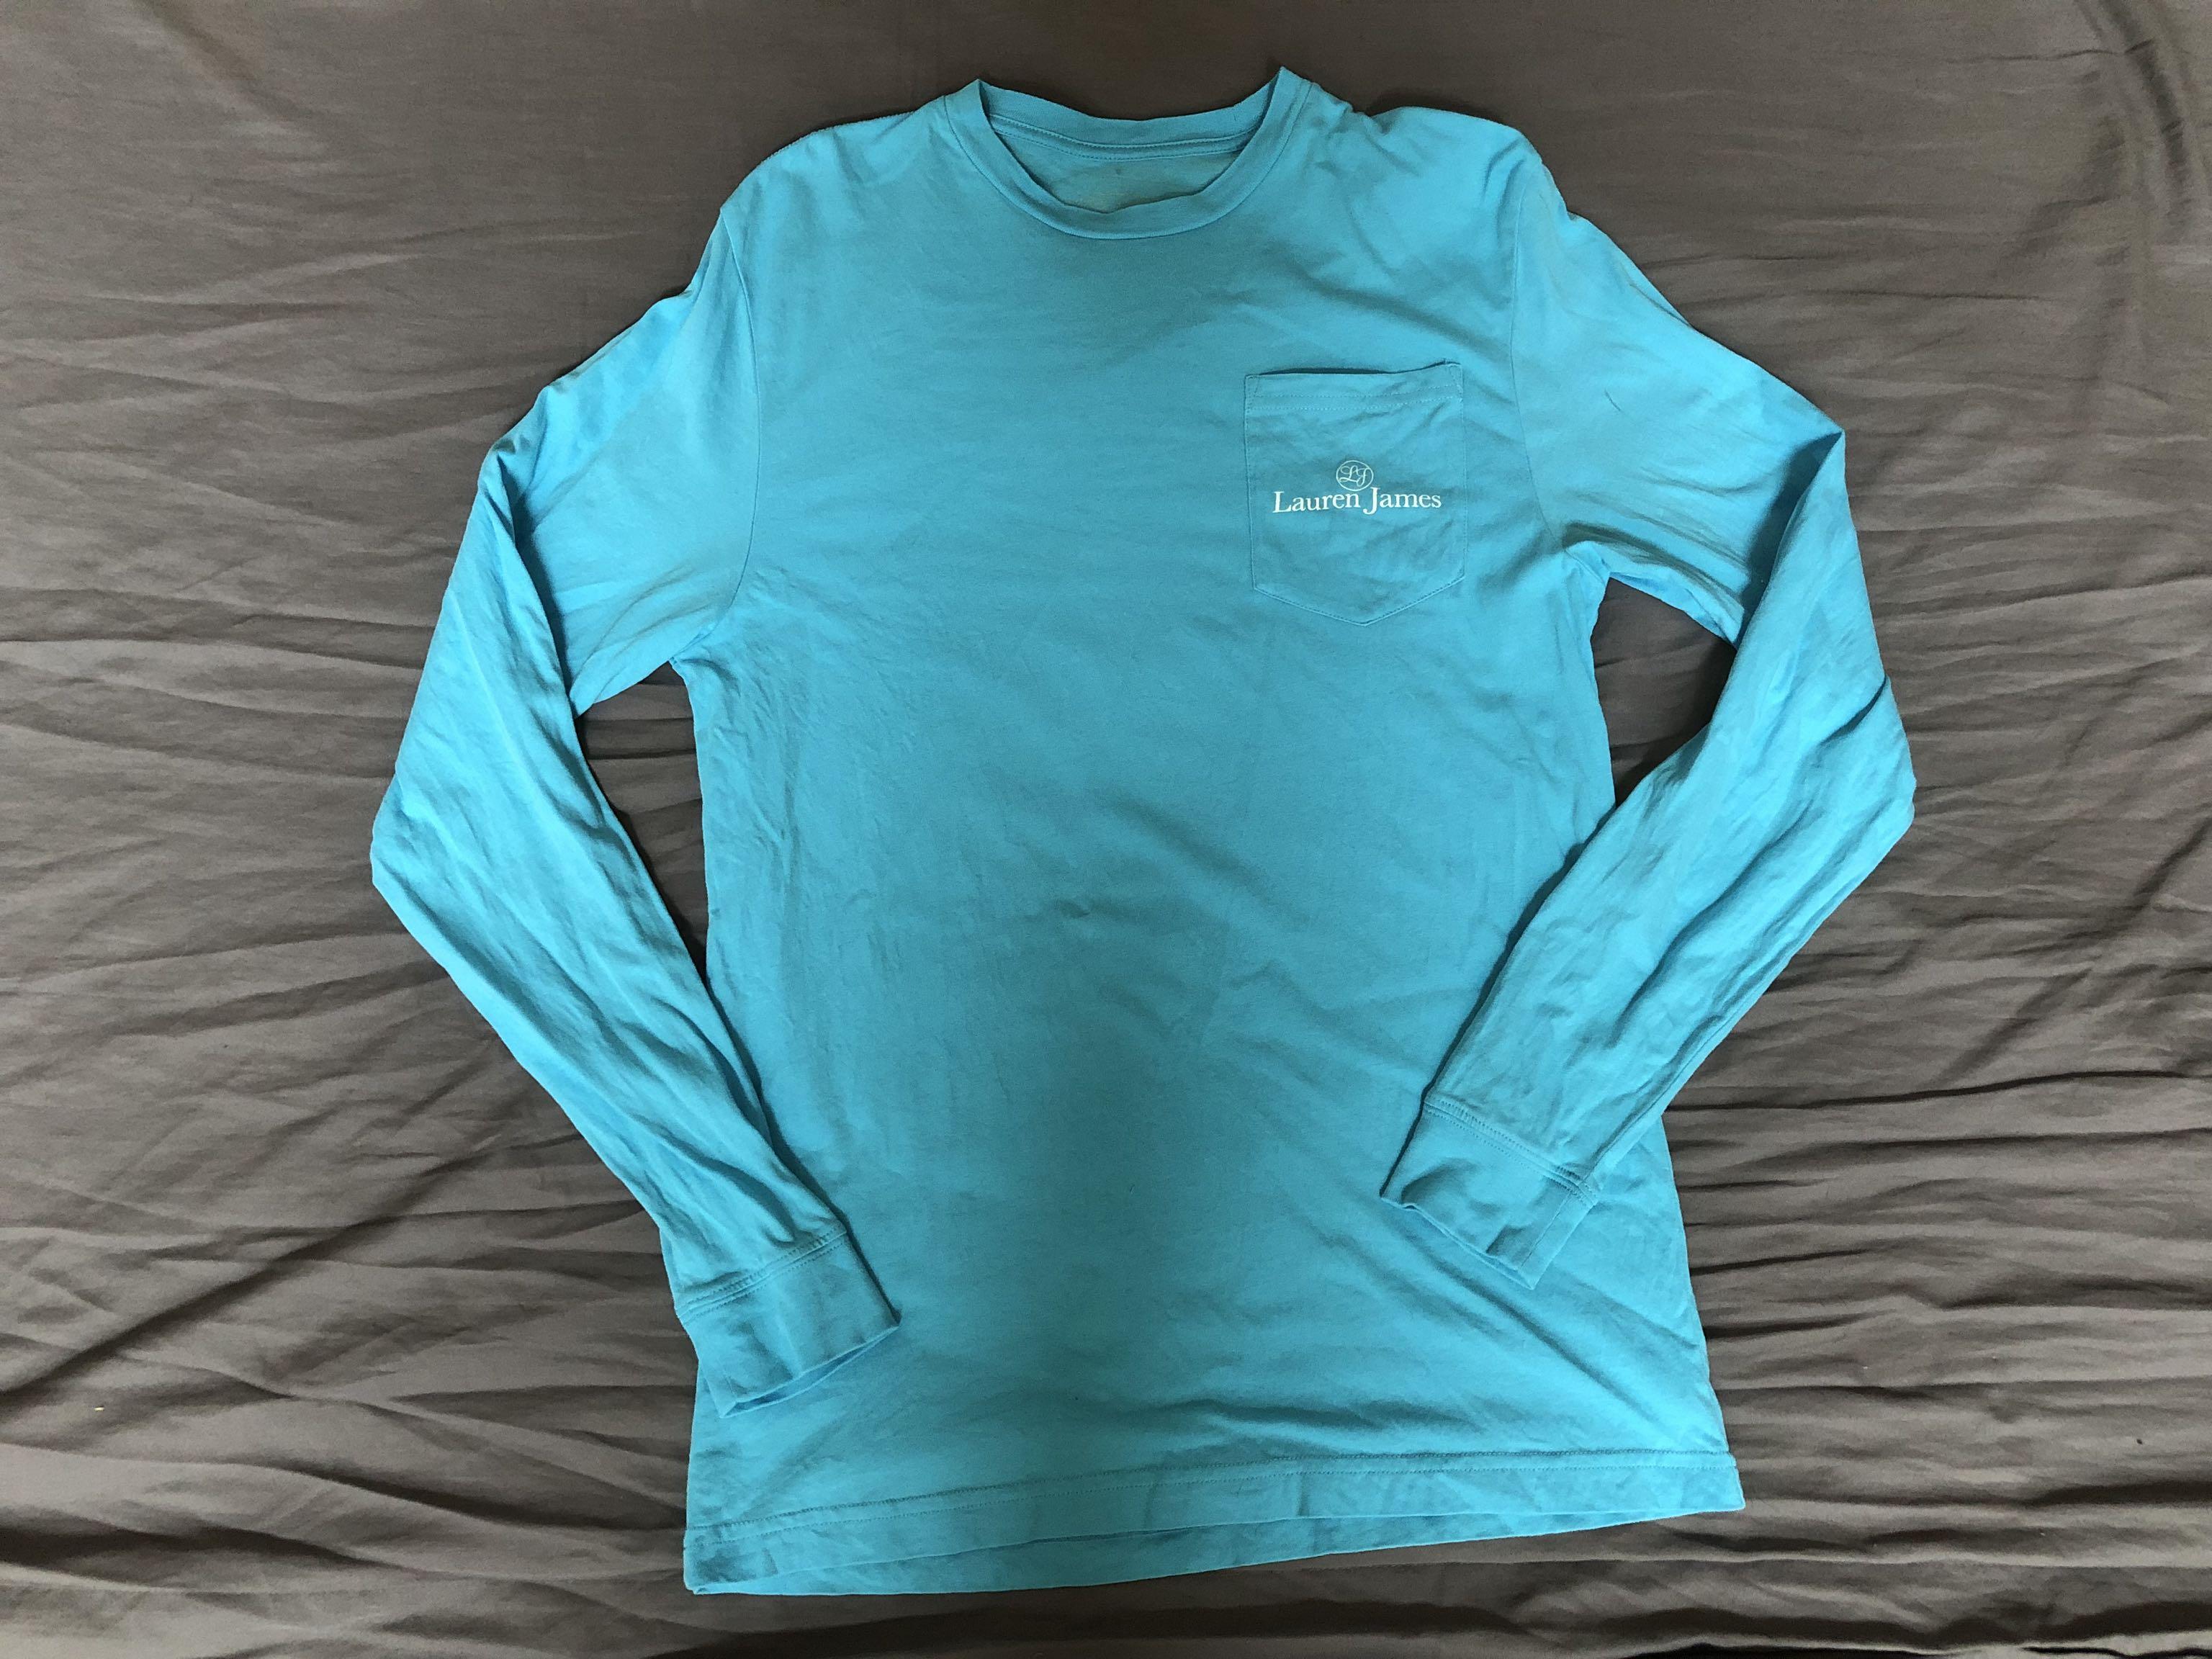 Lauren James long sleeve t shirt - gently worn - small